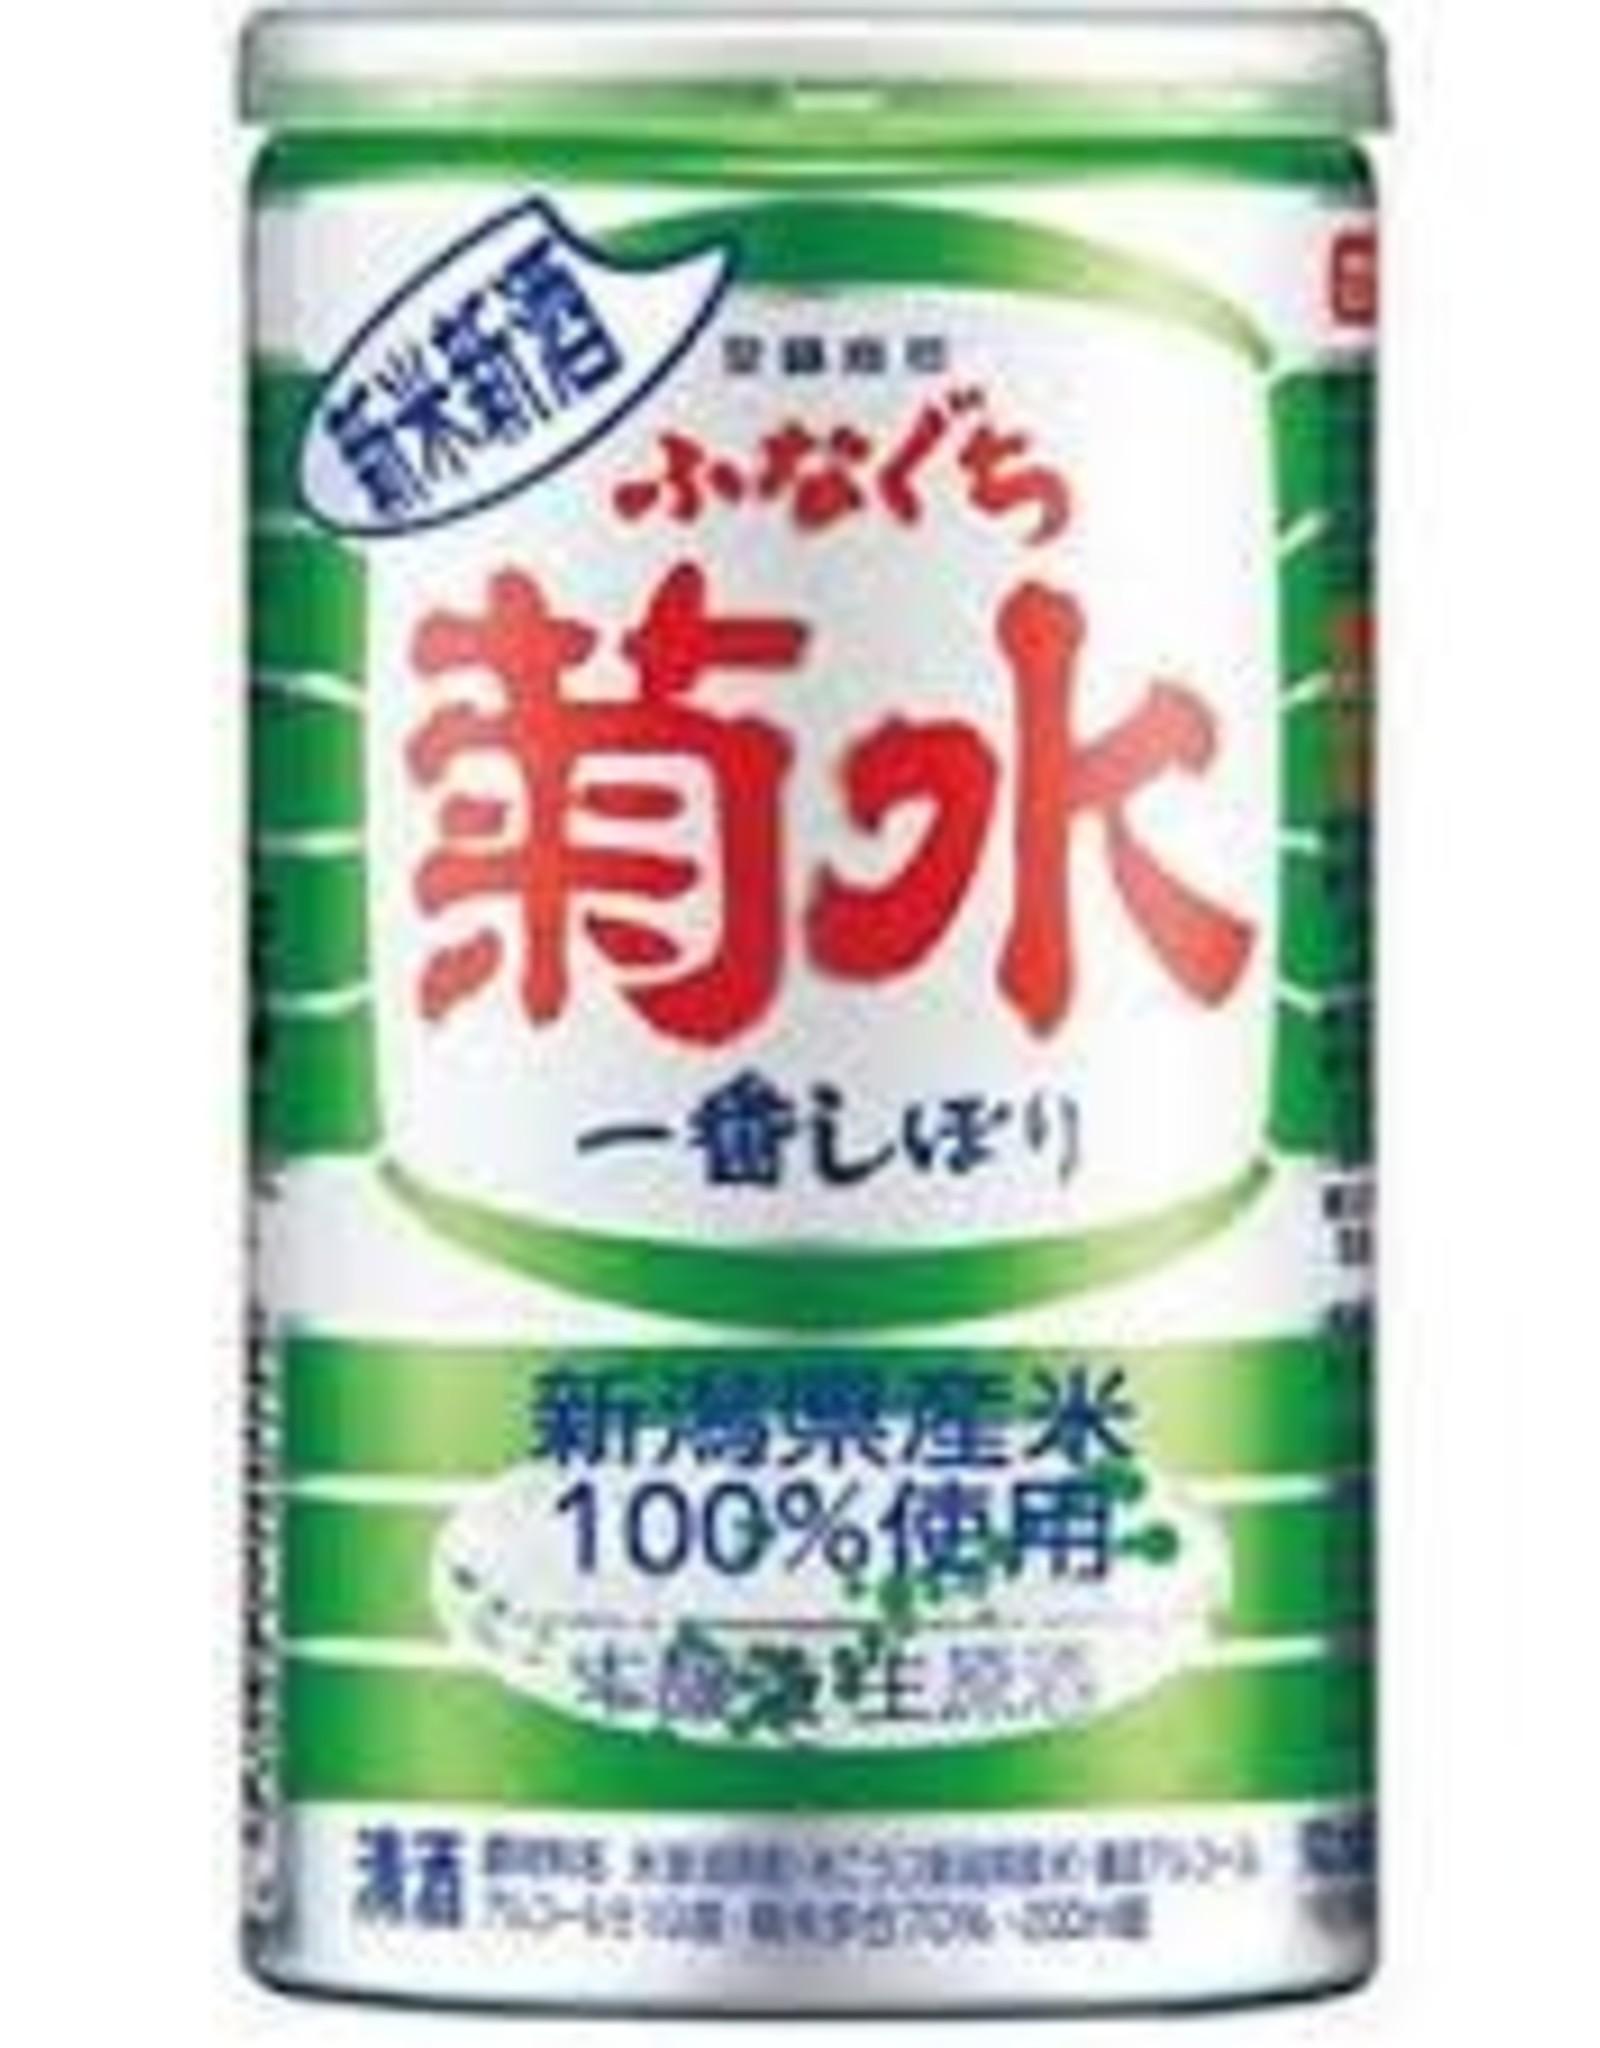 Sake Shinmai Shinshu Funaguchi Kikusui NV  (200 ml Can)